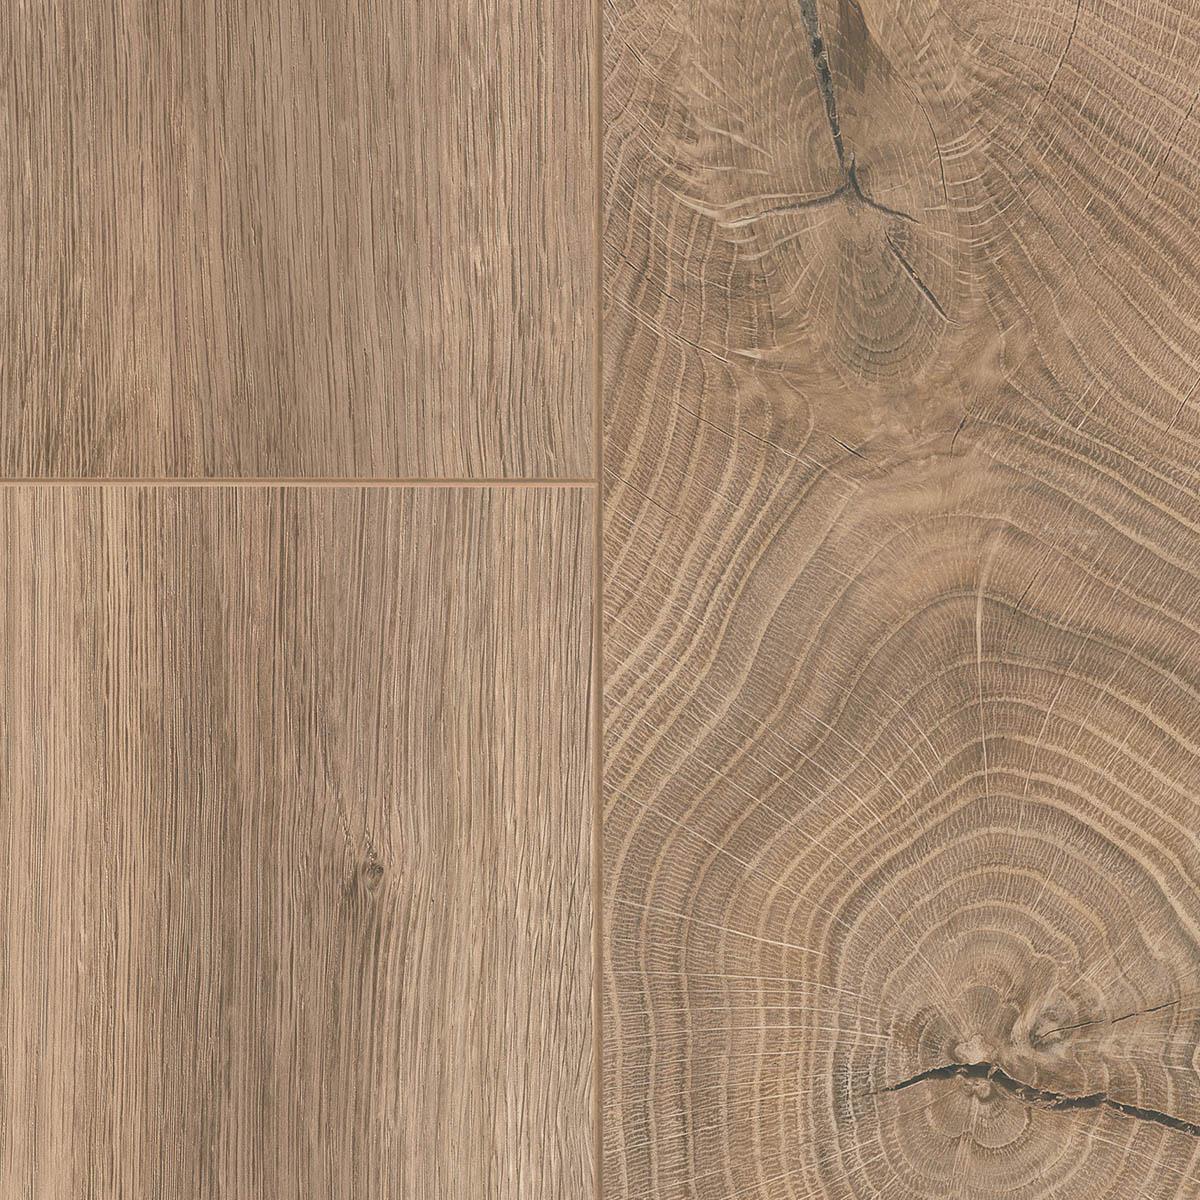 Lodge Oak Flooring, Lodge Oak Laminate Flooring